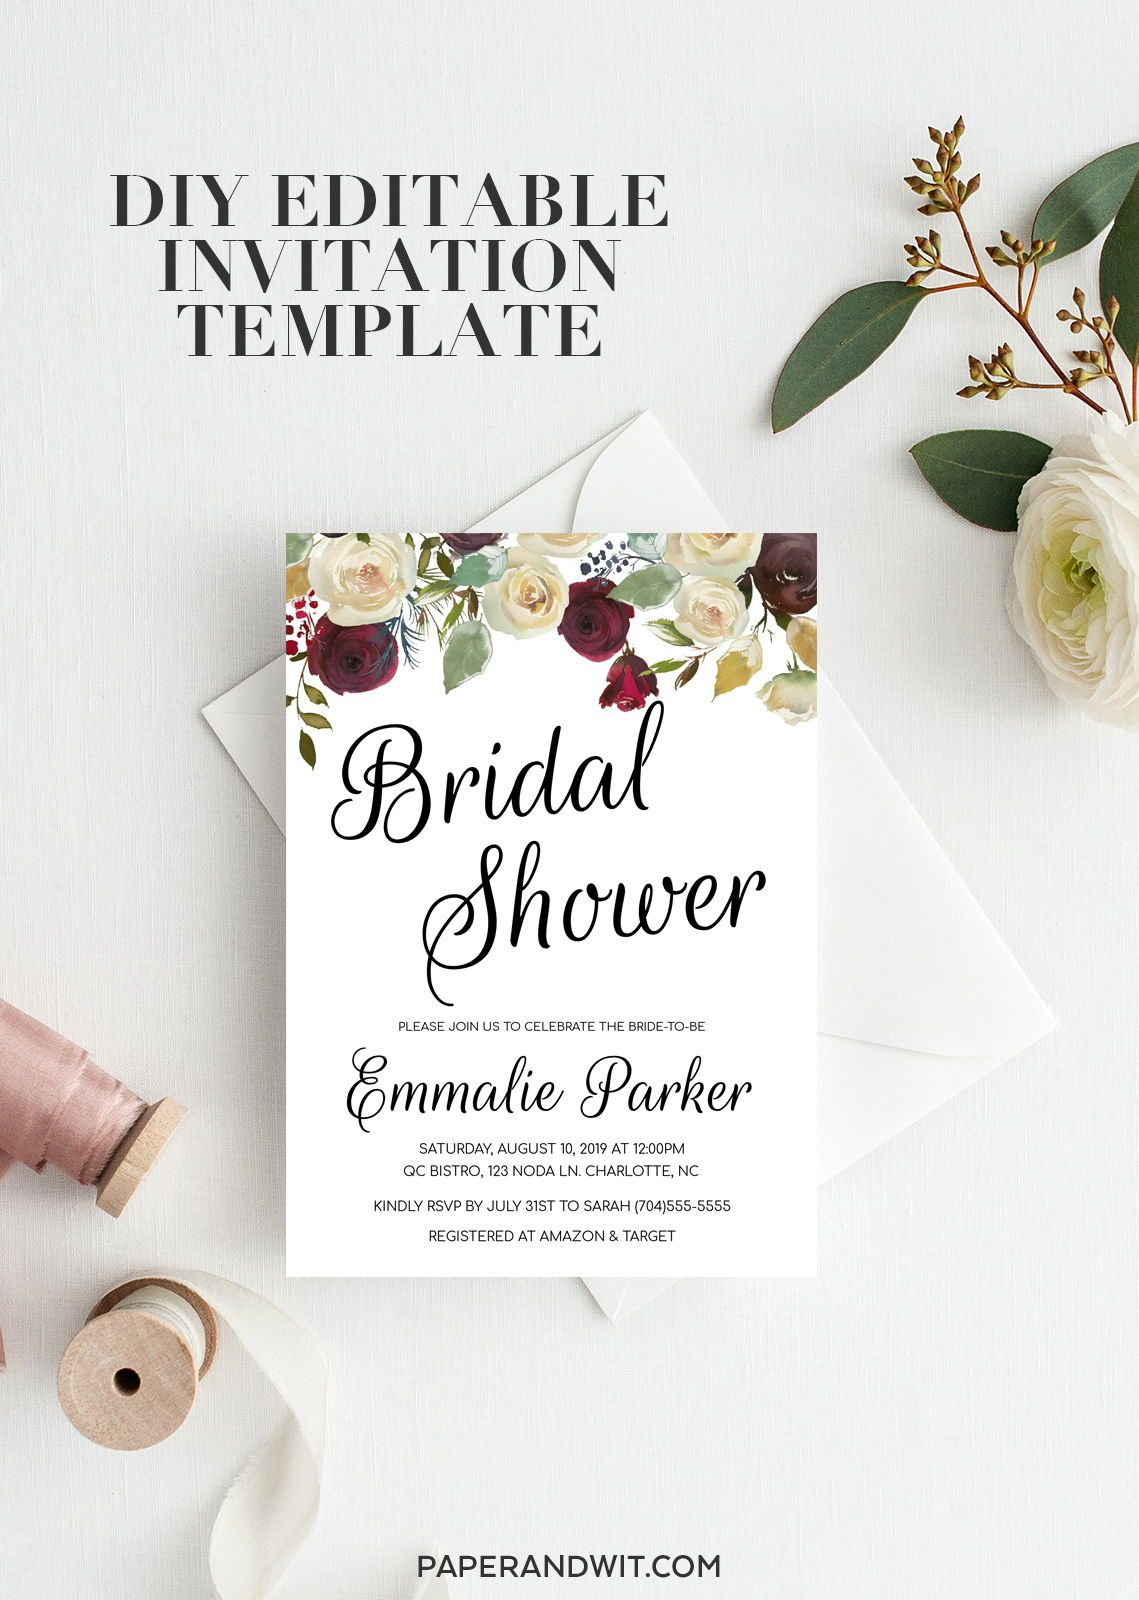 Floral Bridal Shower Invitation Instant Download Floral Etsy Floral Bridal Shower Invitations Bridal Shower Invitations Printable Bridal Shower Invitations